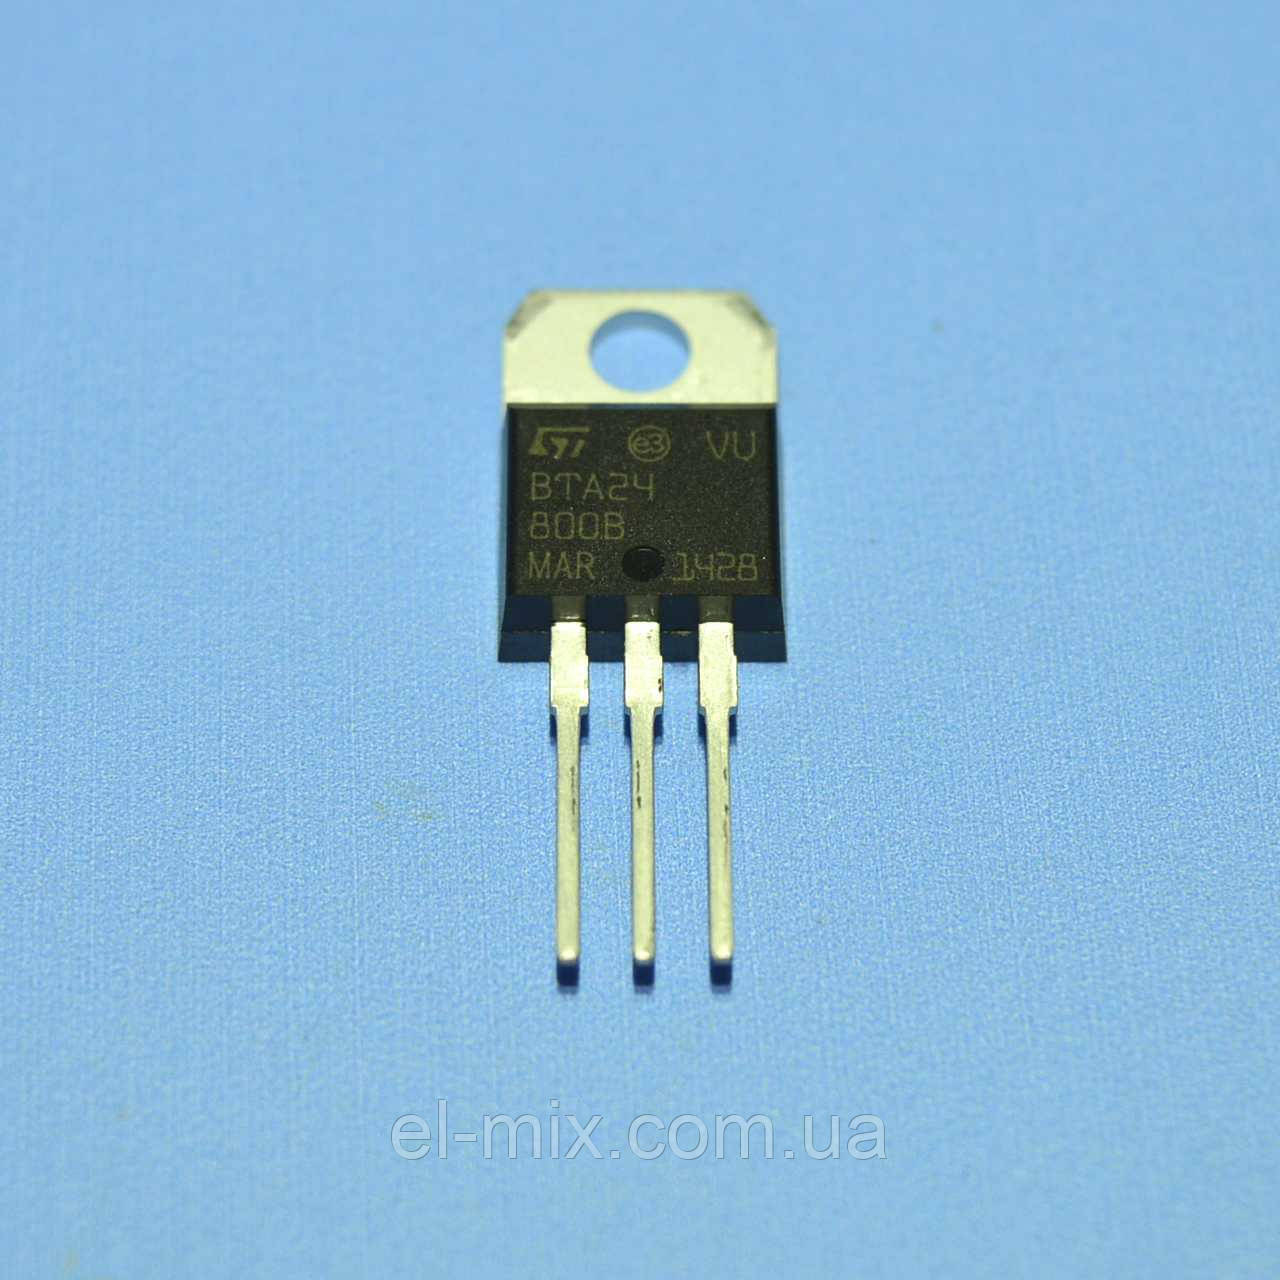 Симистор BTA24-800B  TO-220  STM/China